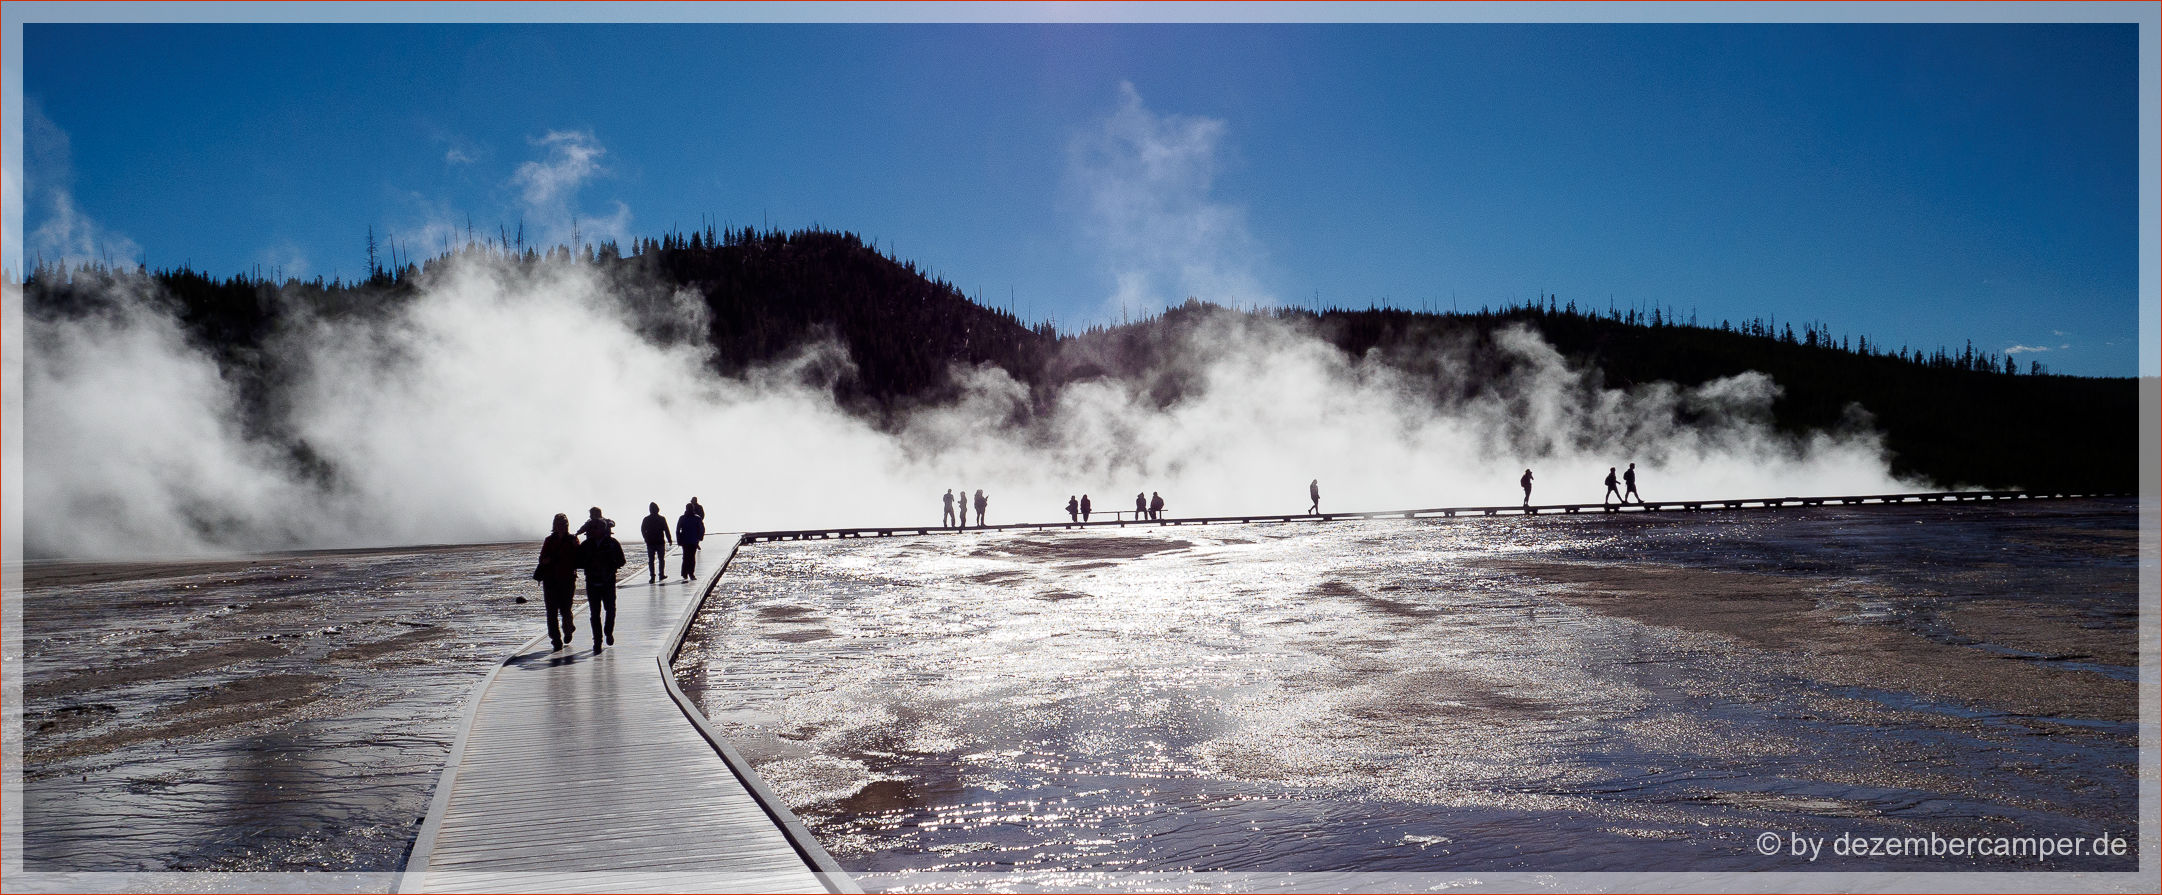 Yellowstone NP - Midway Geysir Basin